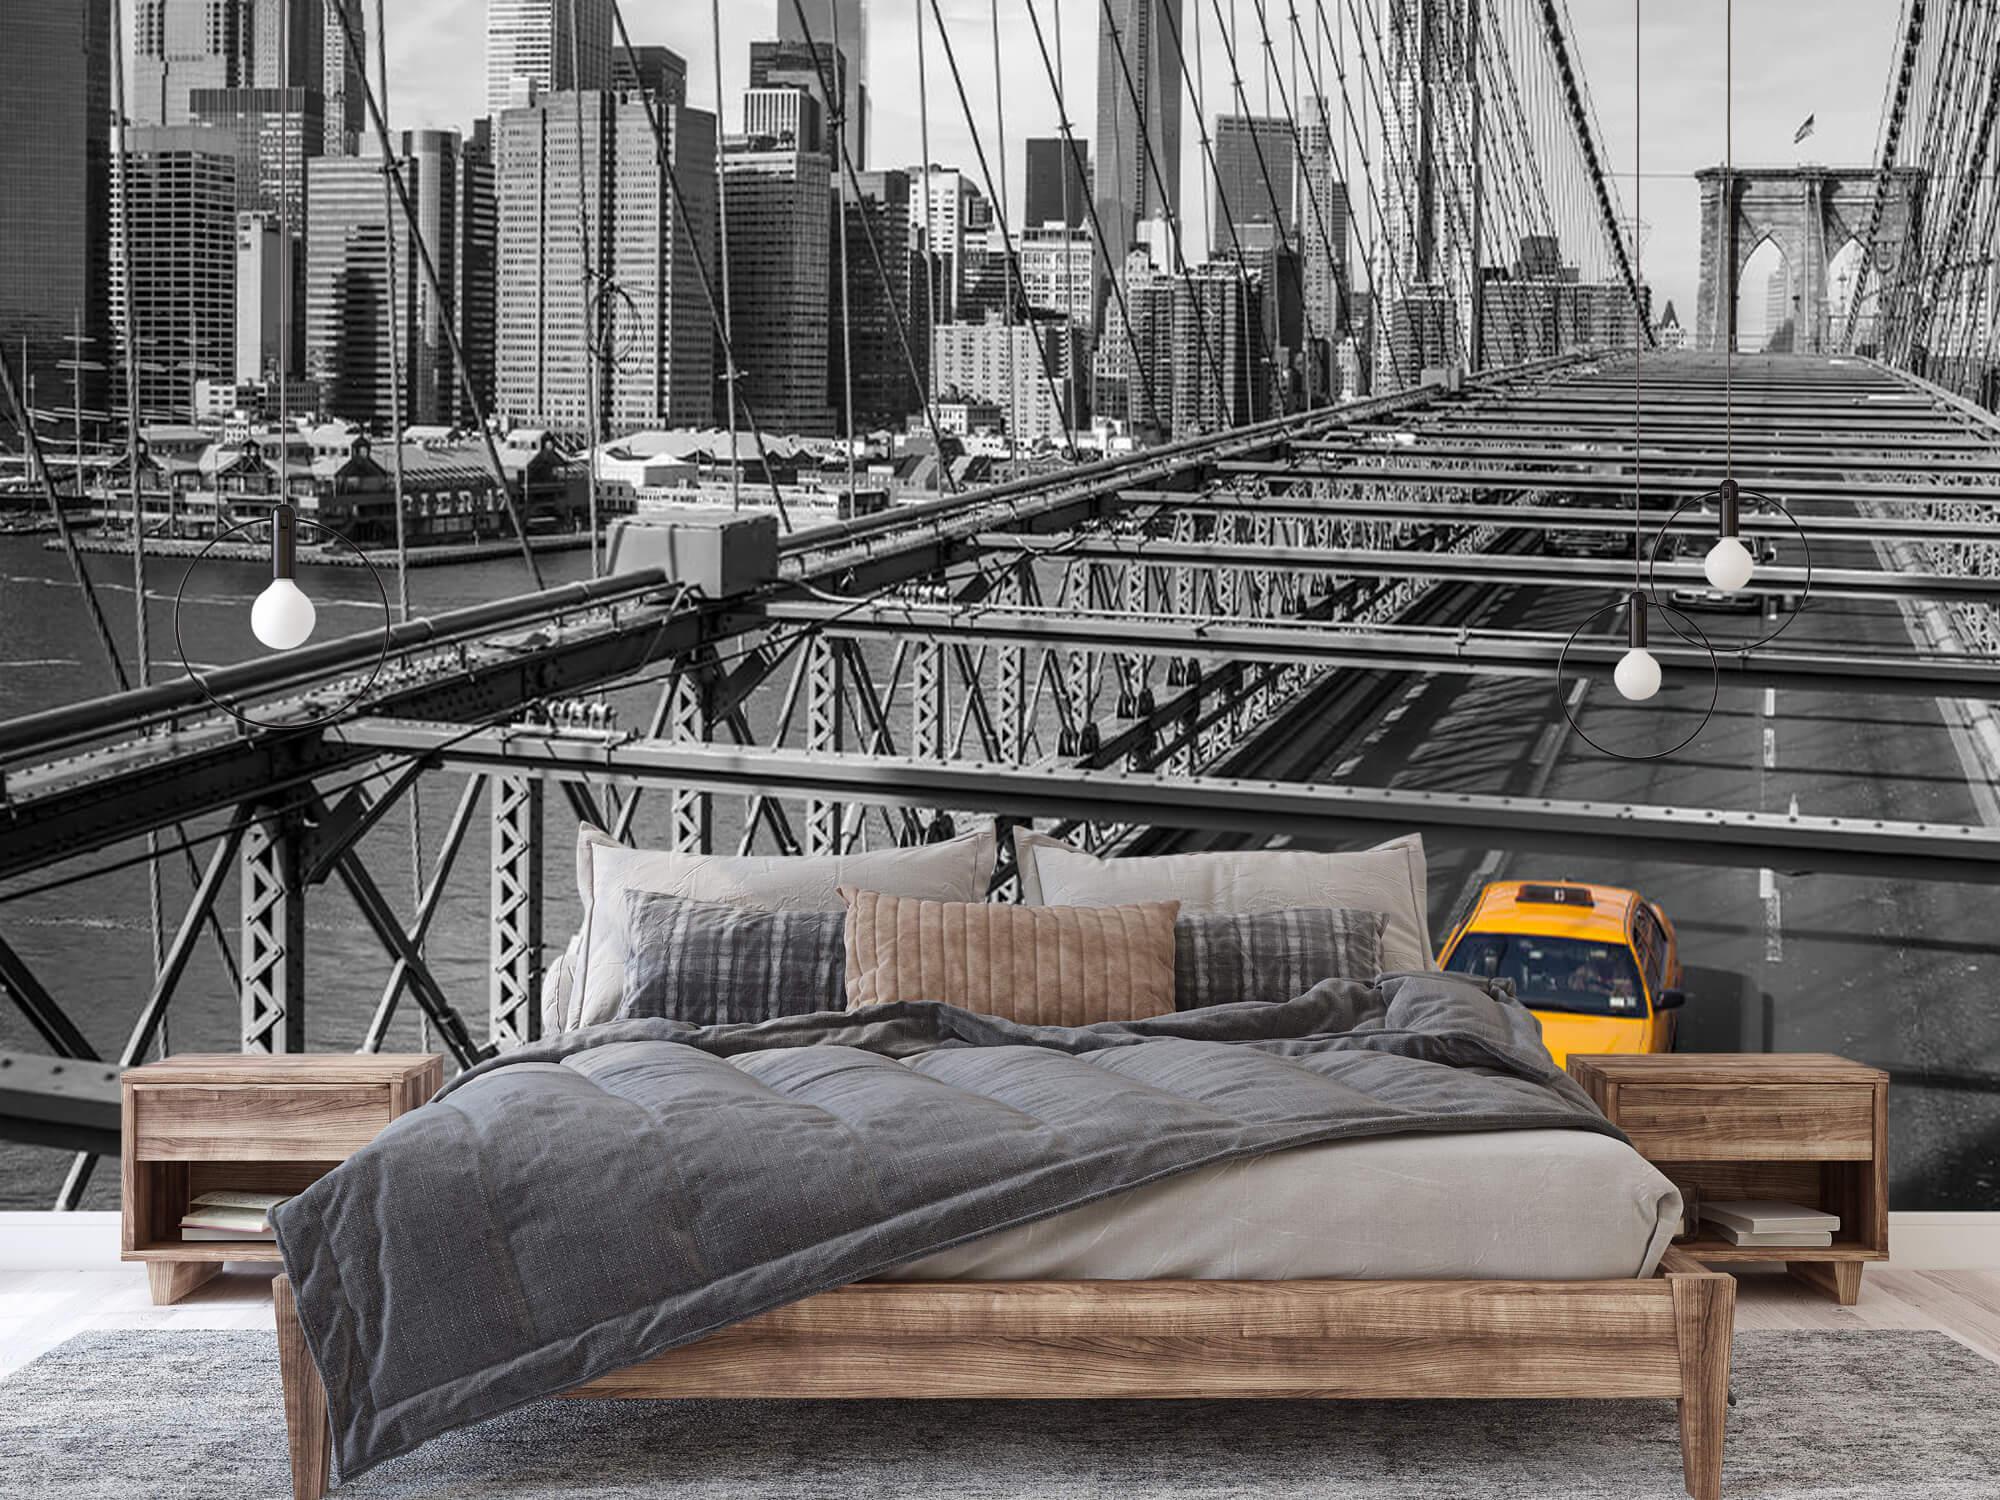 A taxi across the Brooklyn Bridge 5